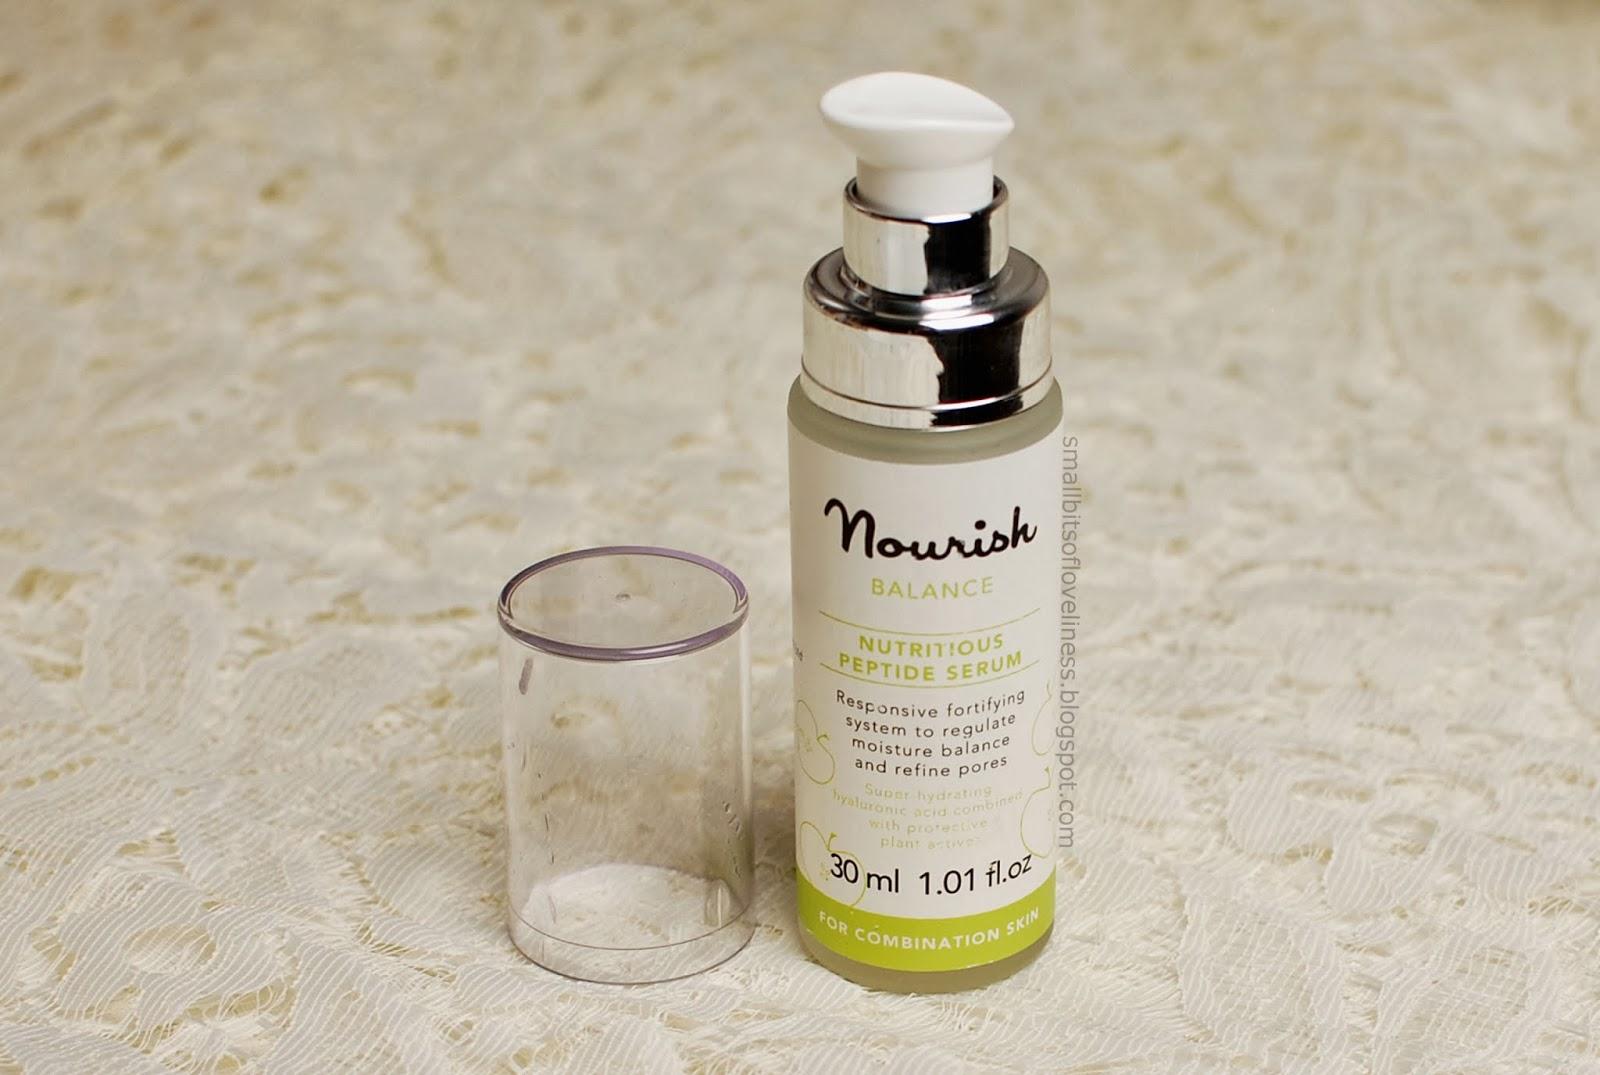 Nourish Peptide Serum Balance